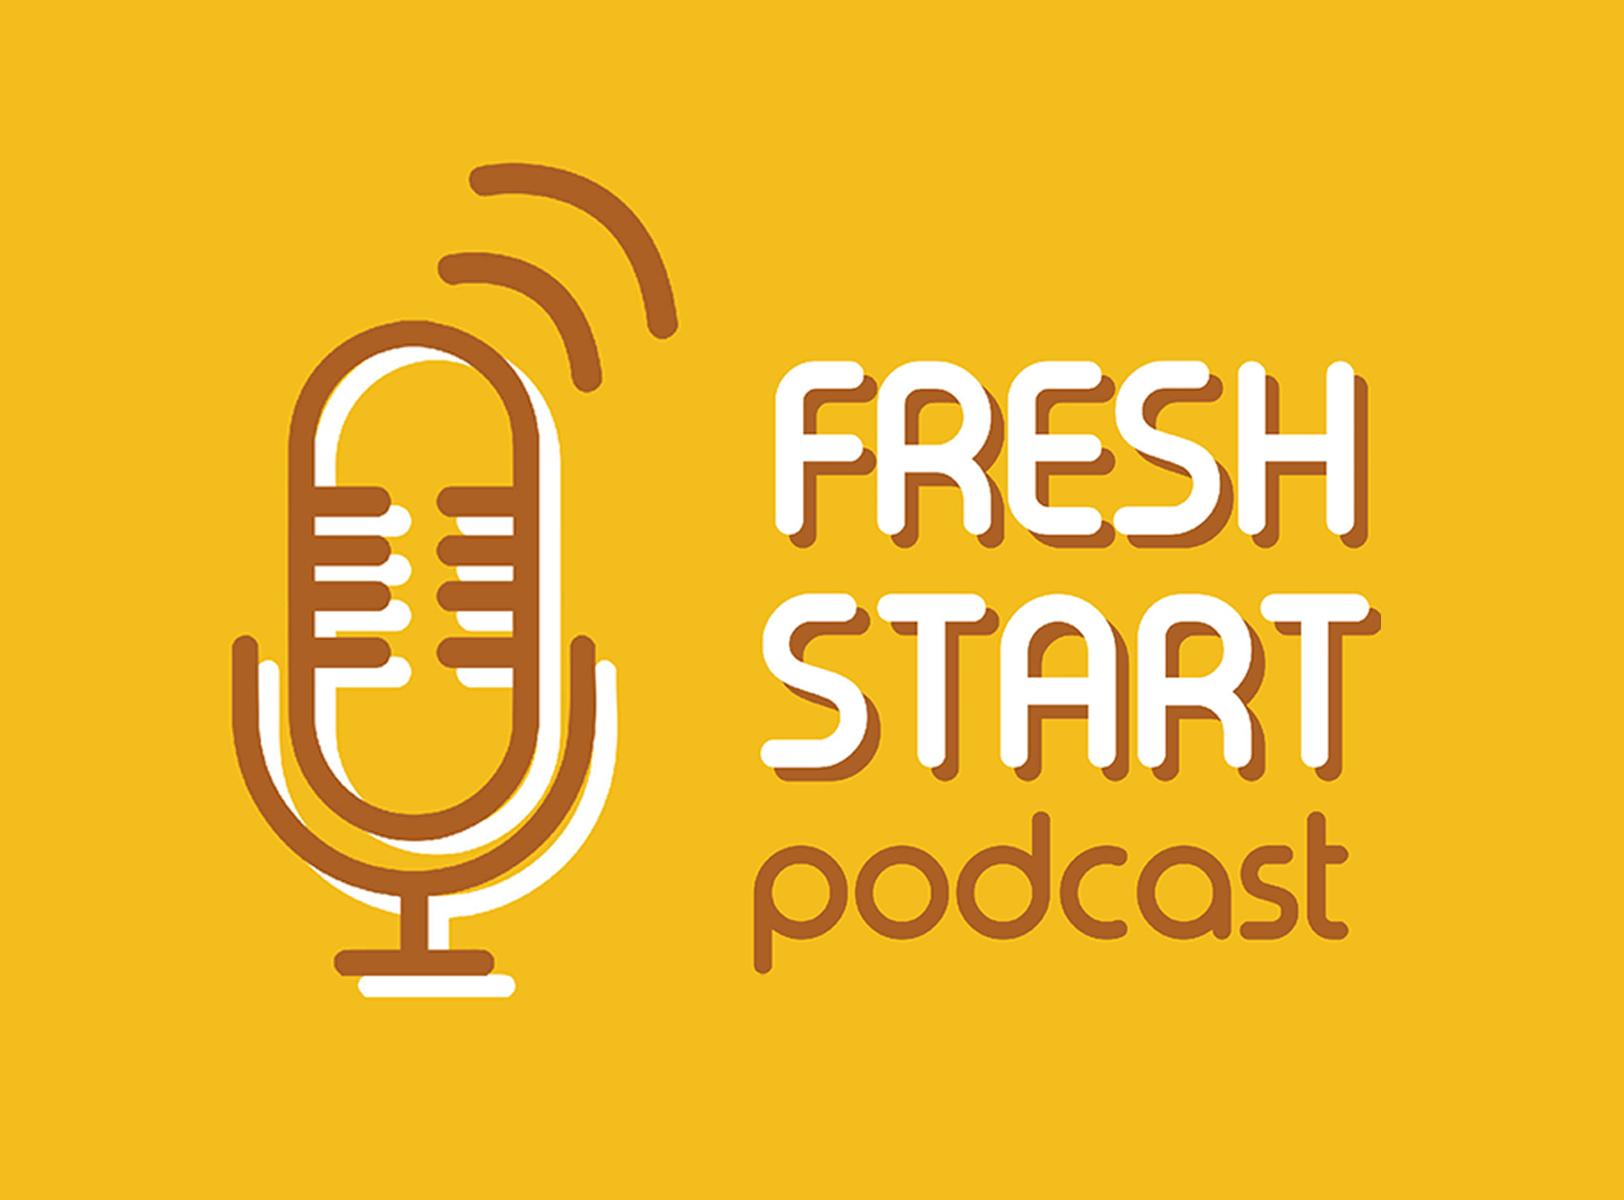 Fresh Start: Podcast News (5/15/2019 Wed.)